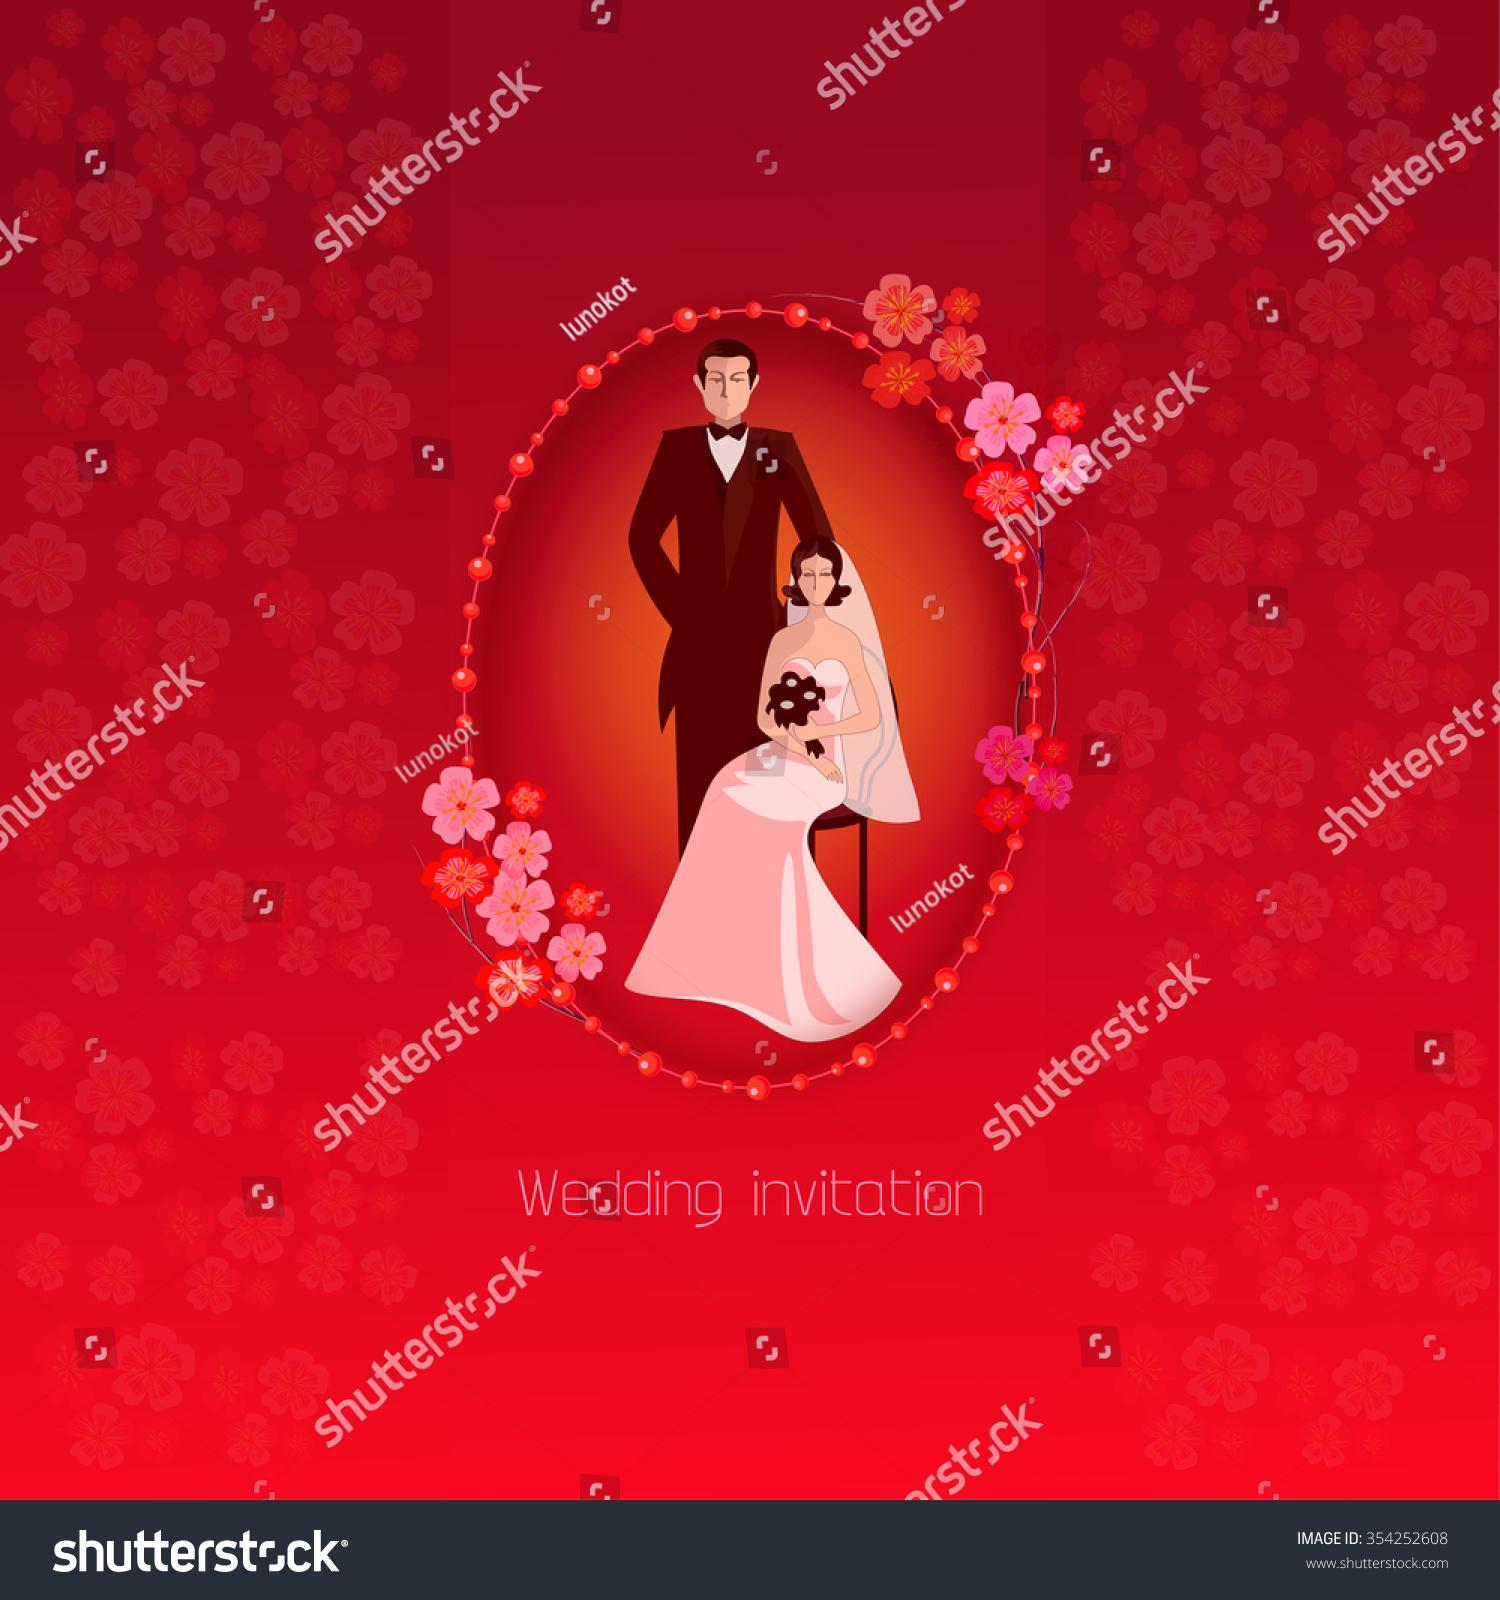 Red Wedding Invitation Spring Flowers Sakura Stock Vector (Royalty ...